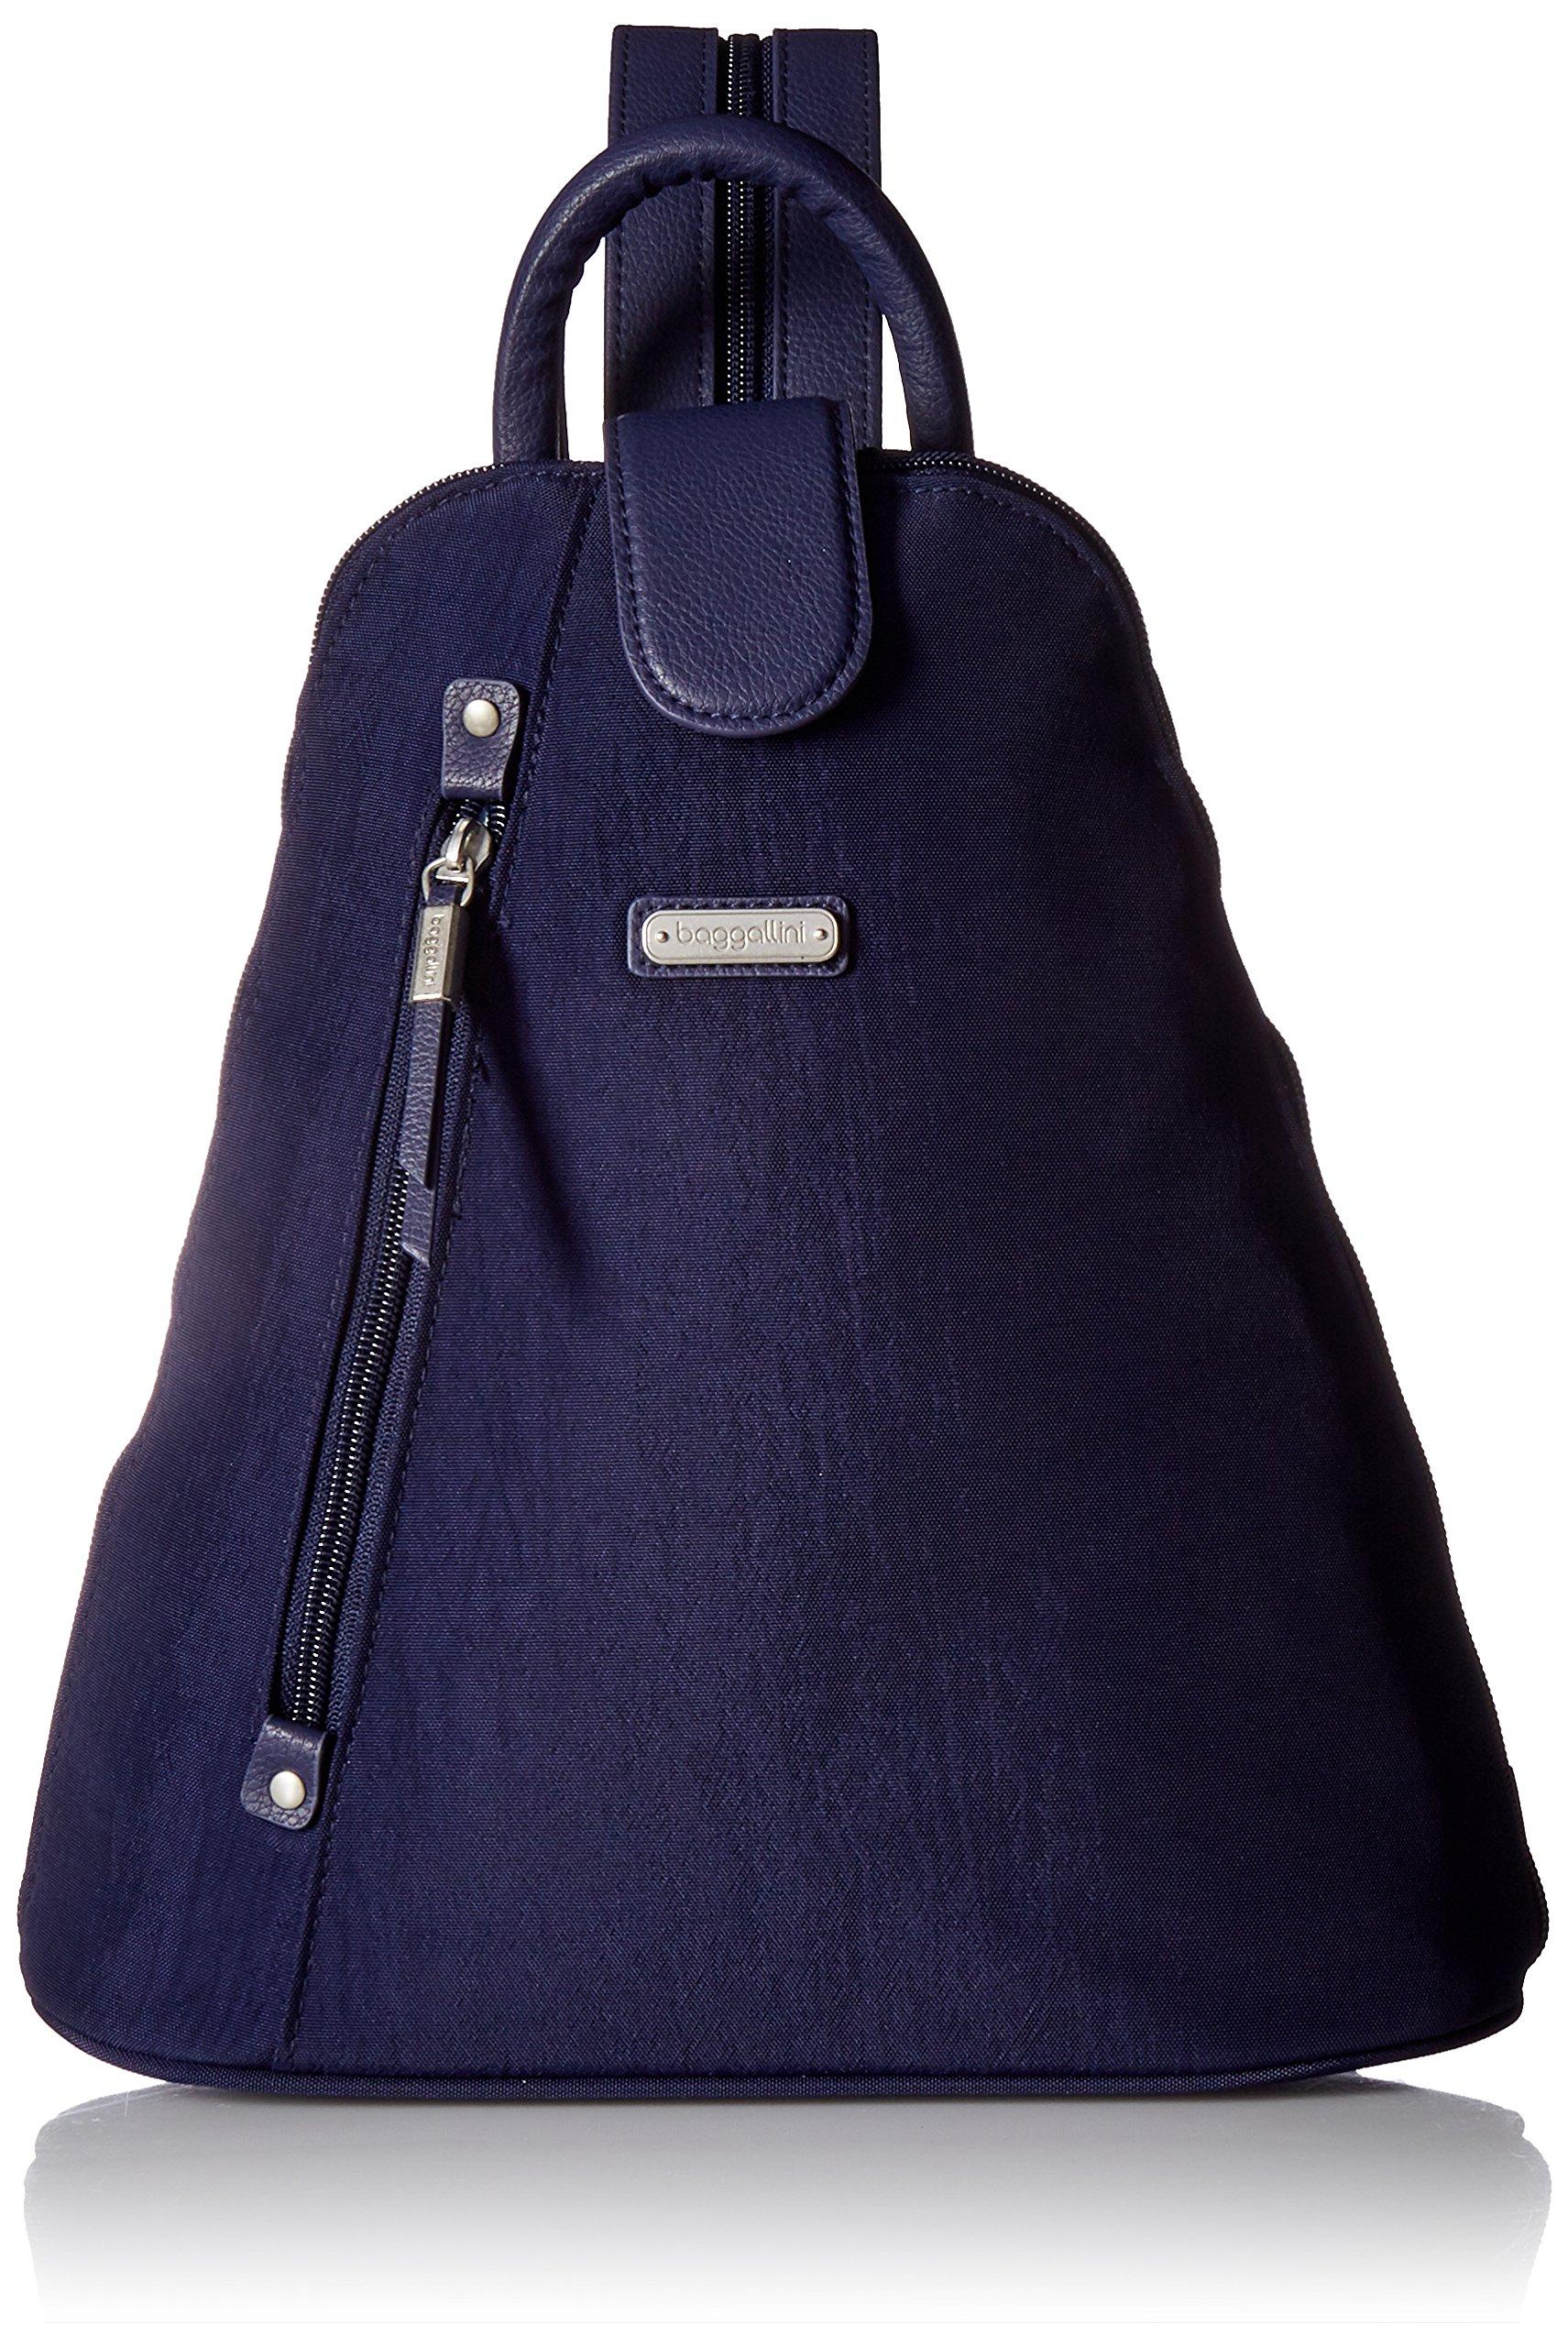 Baggallini Metro Backpack with RFID Phone Wristlet, navy